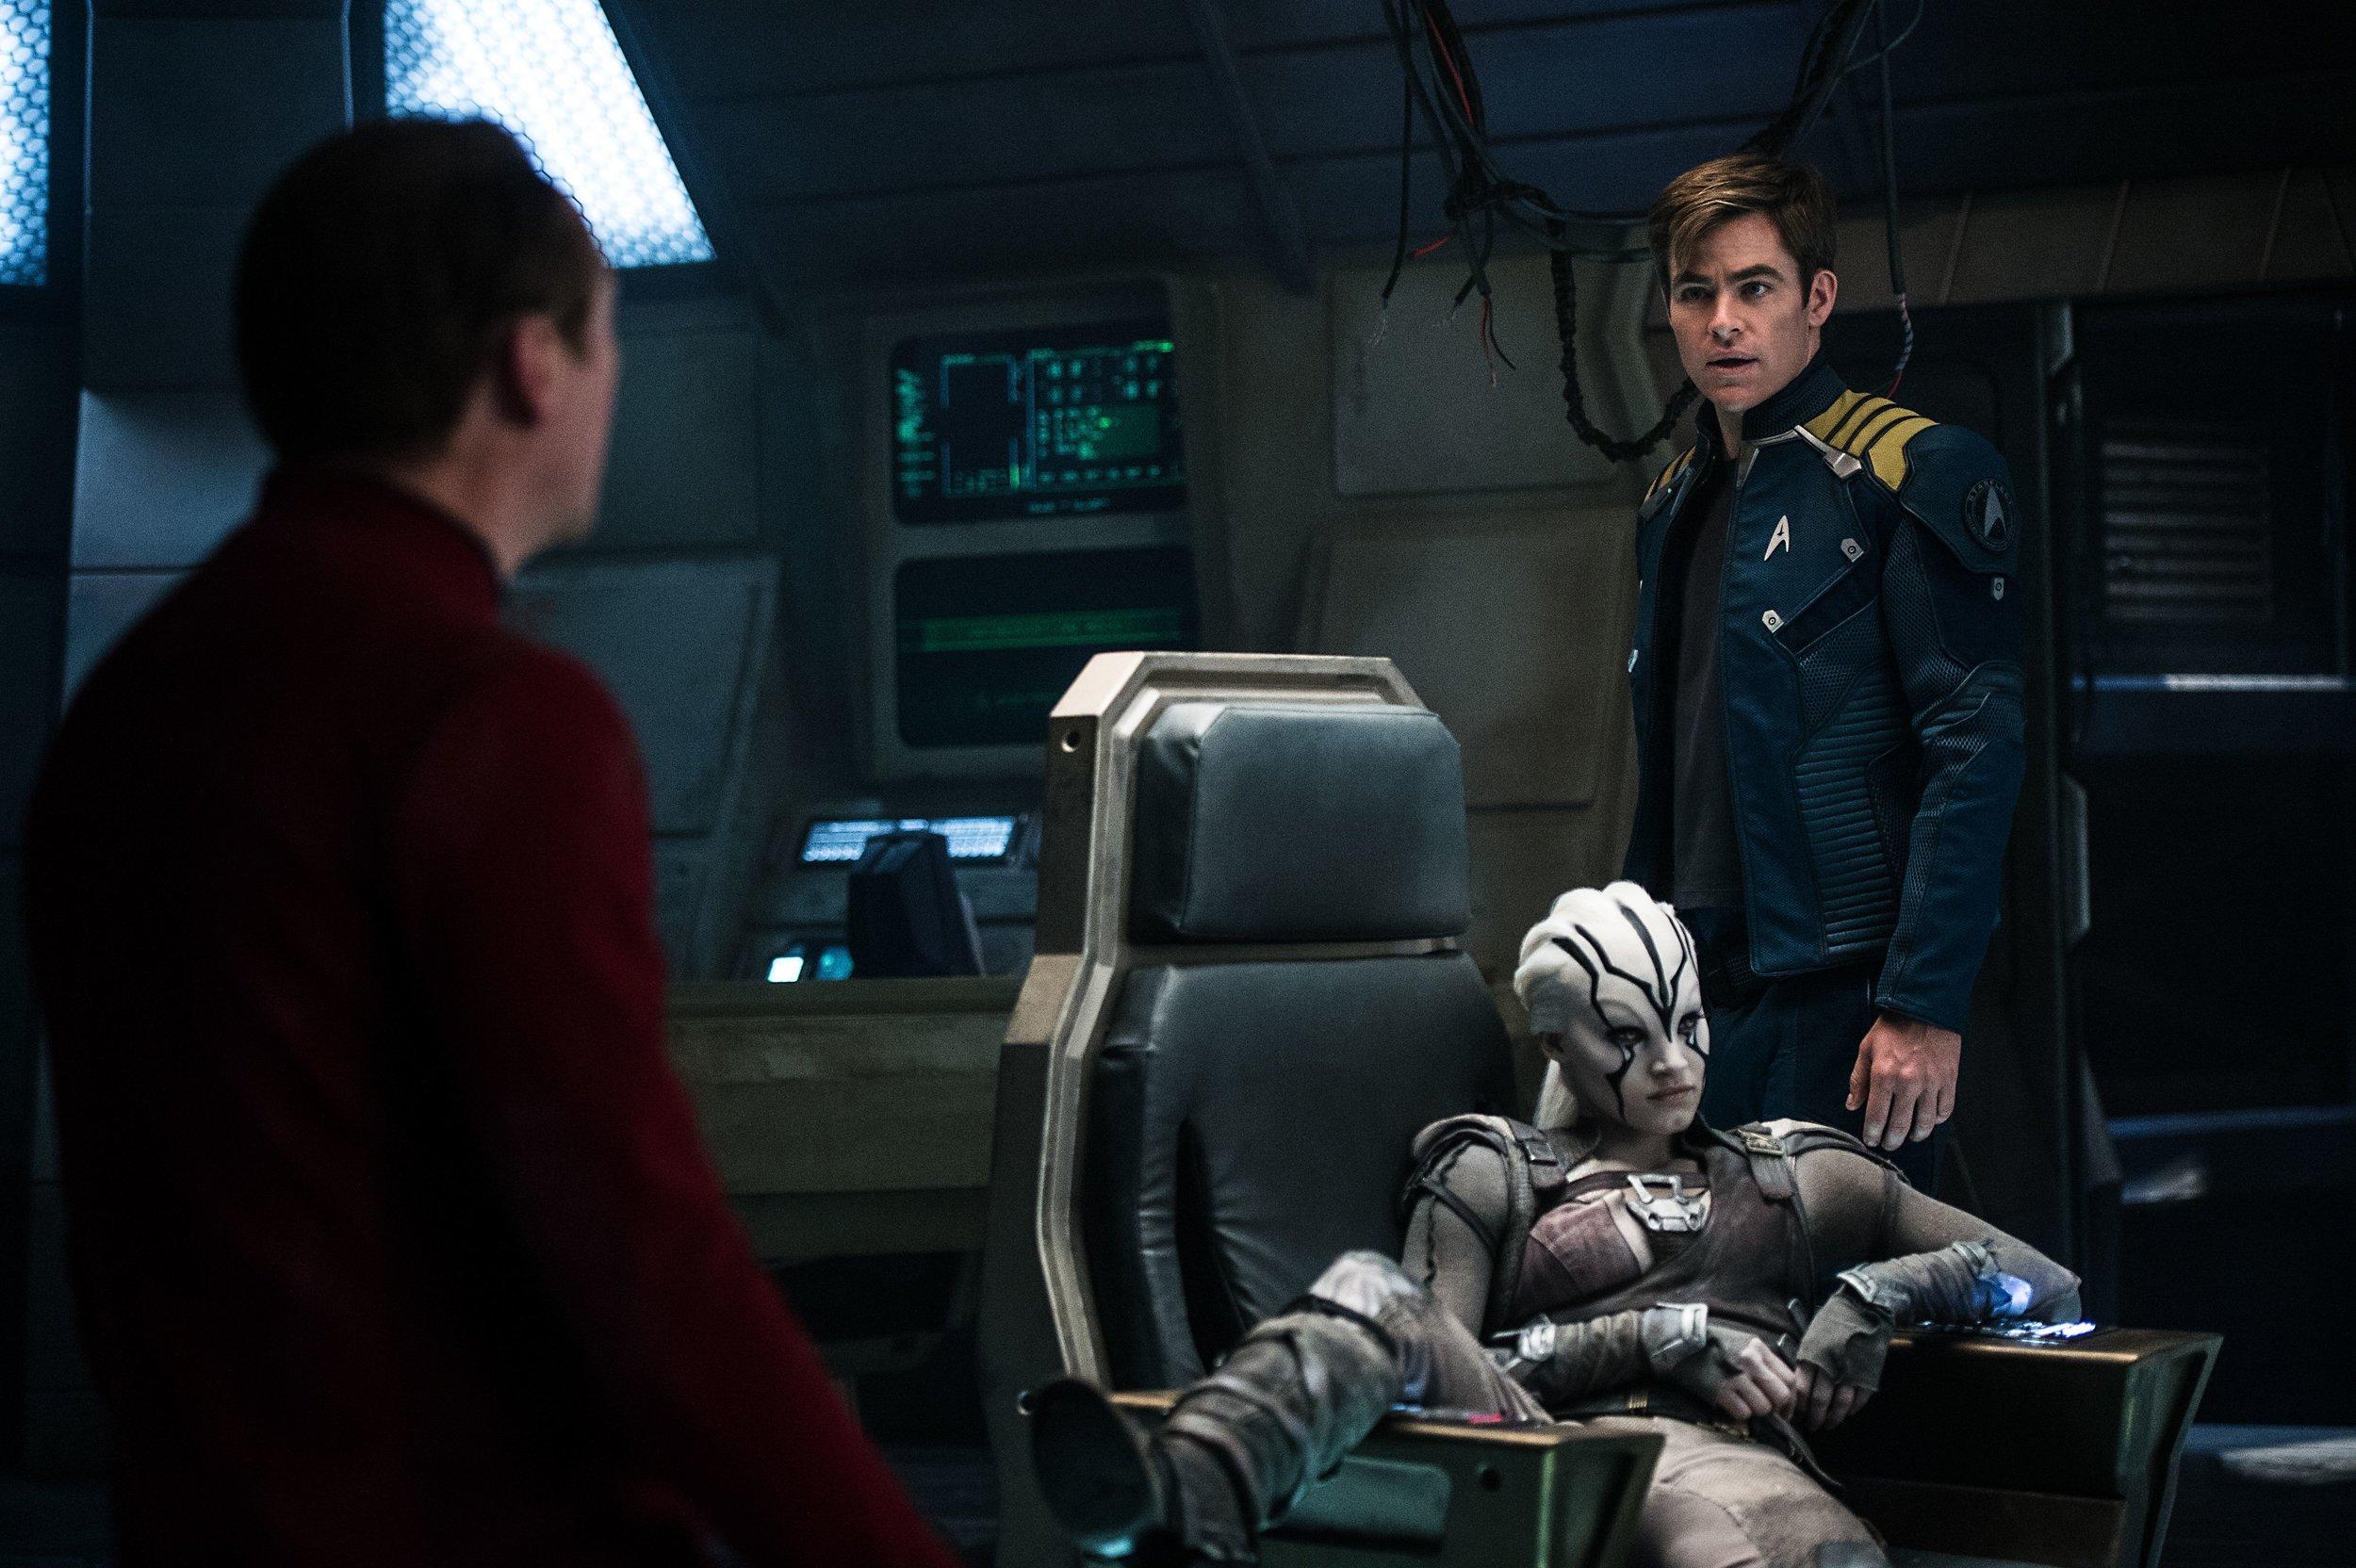 Simon-Pegg-Sofia-Boutella-and-Chris-Pine-in-Star-Trek-Beyond.jpg